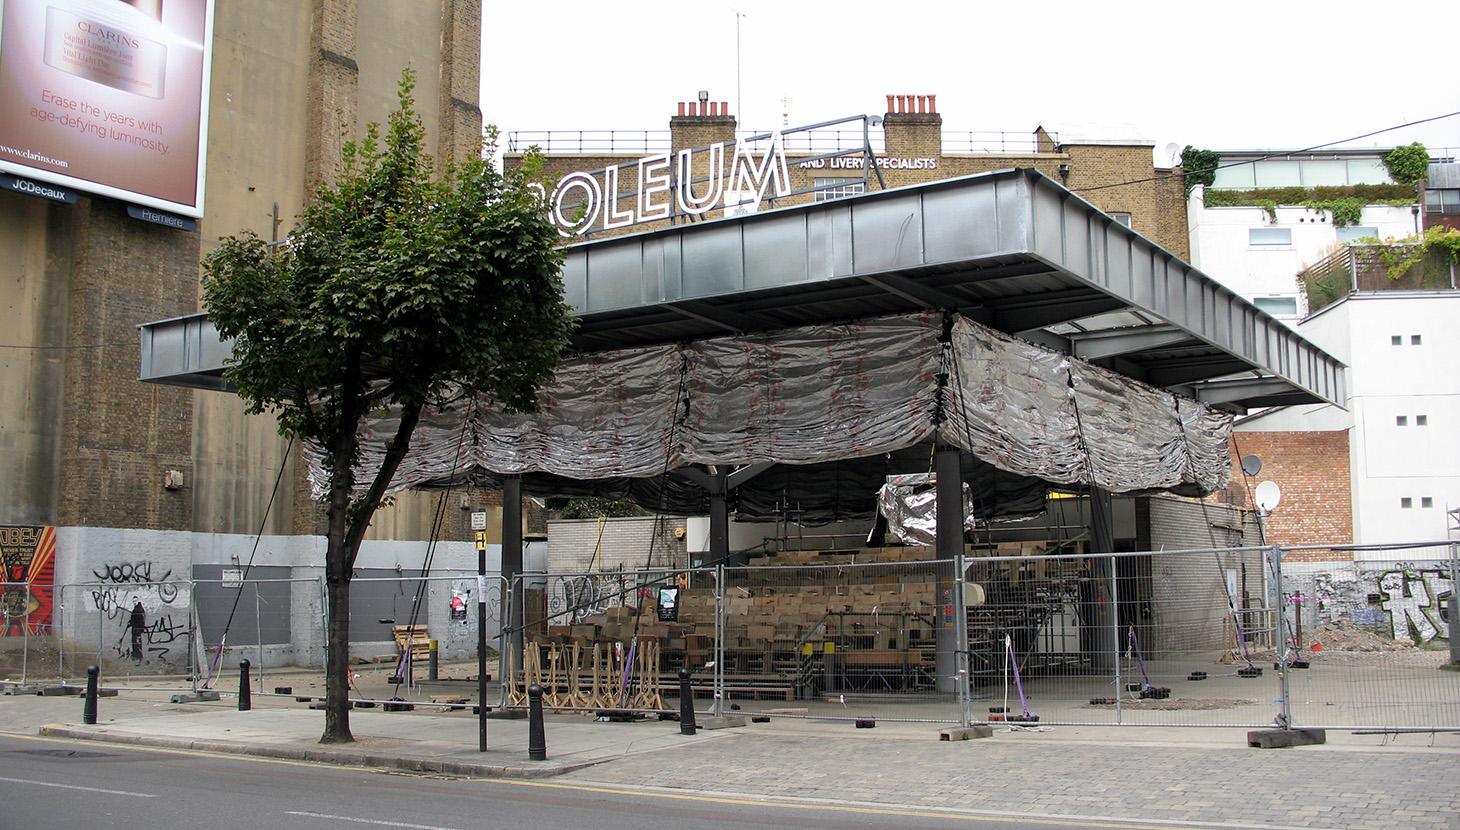 Cineroleum, Clerkenwell Road, London